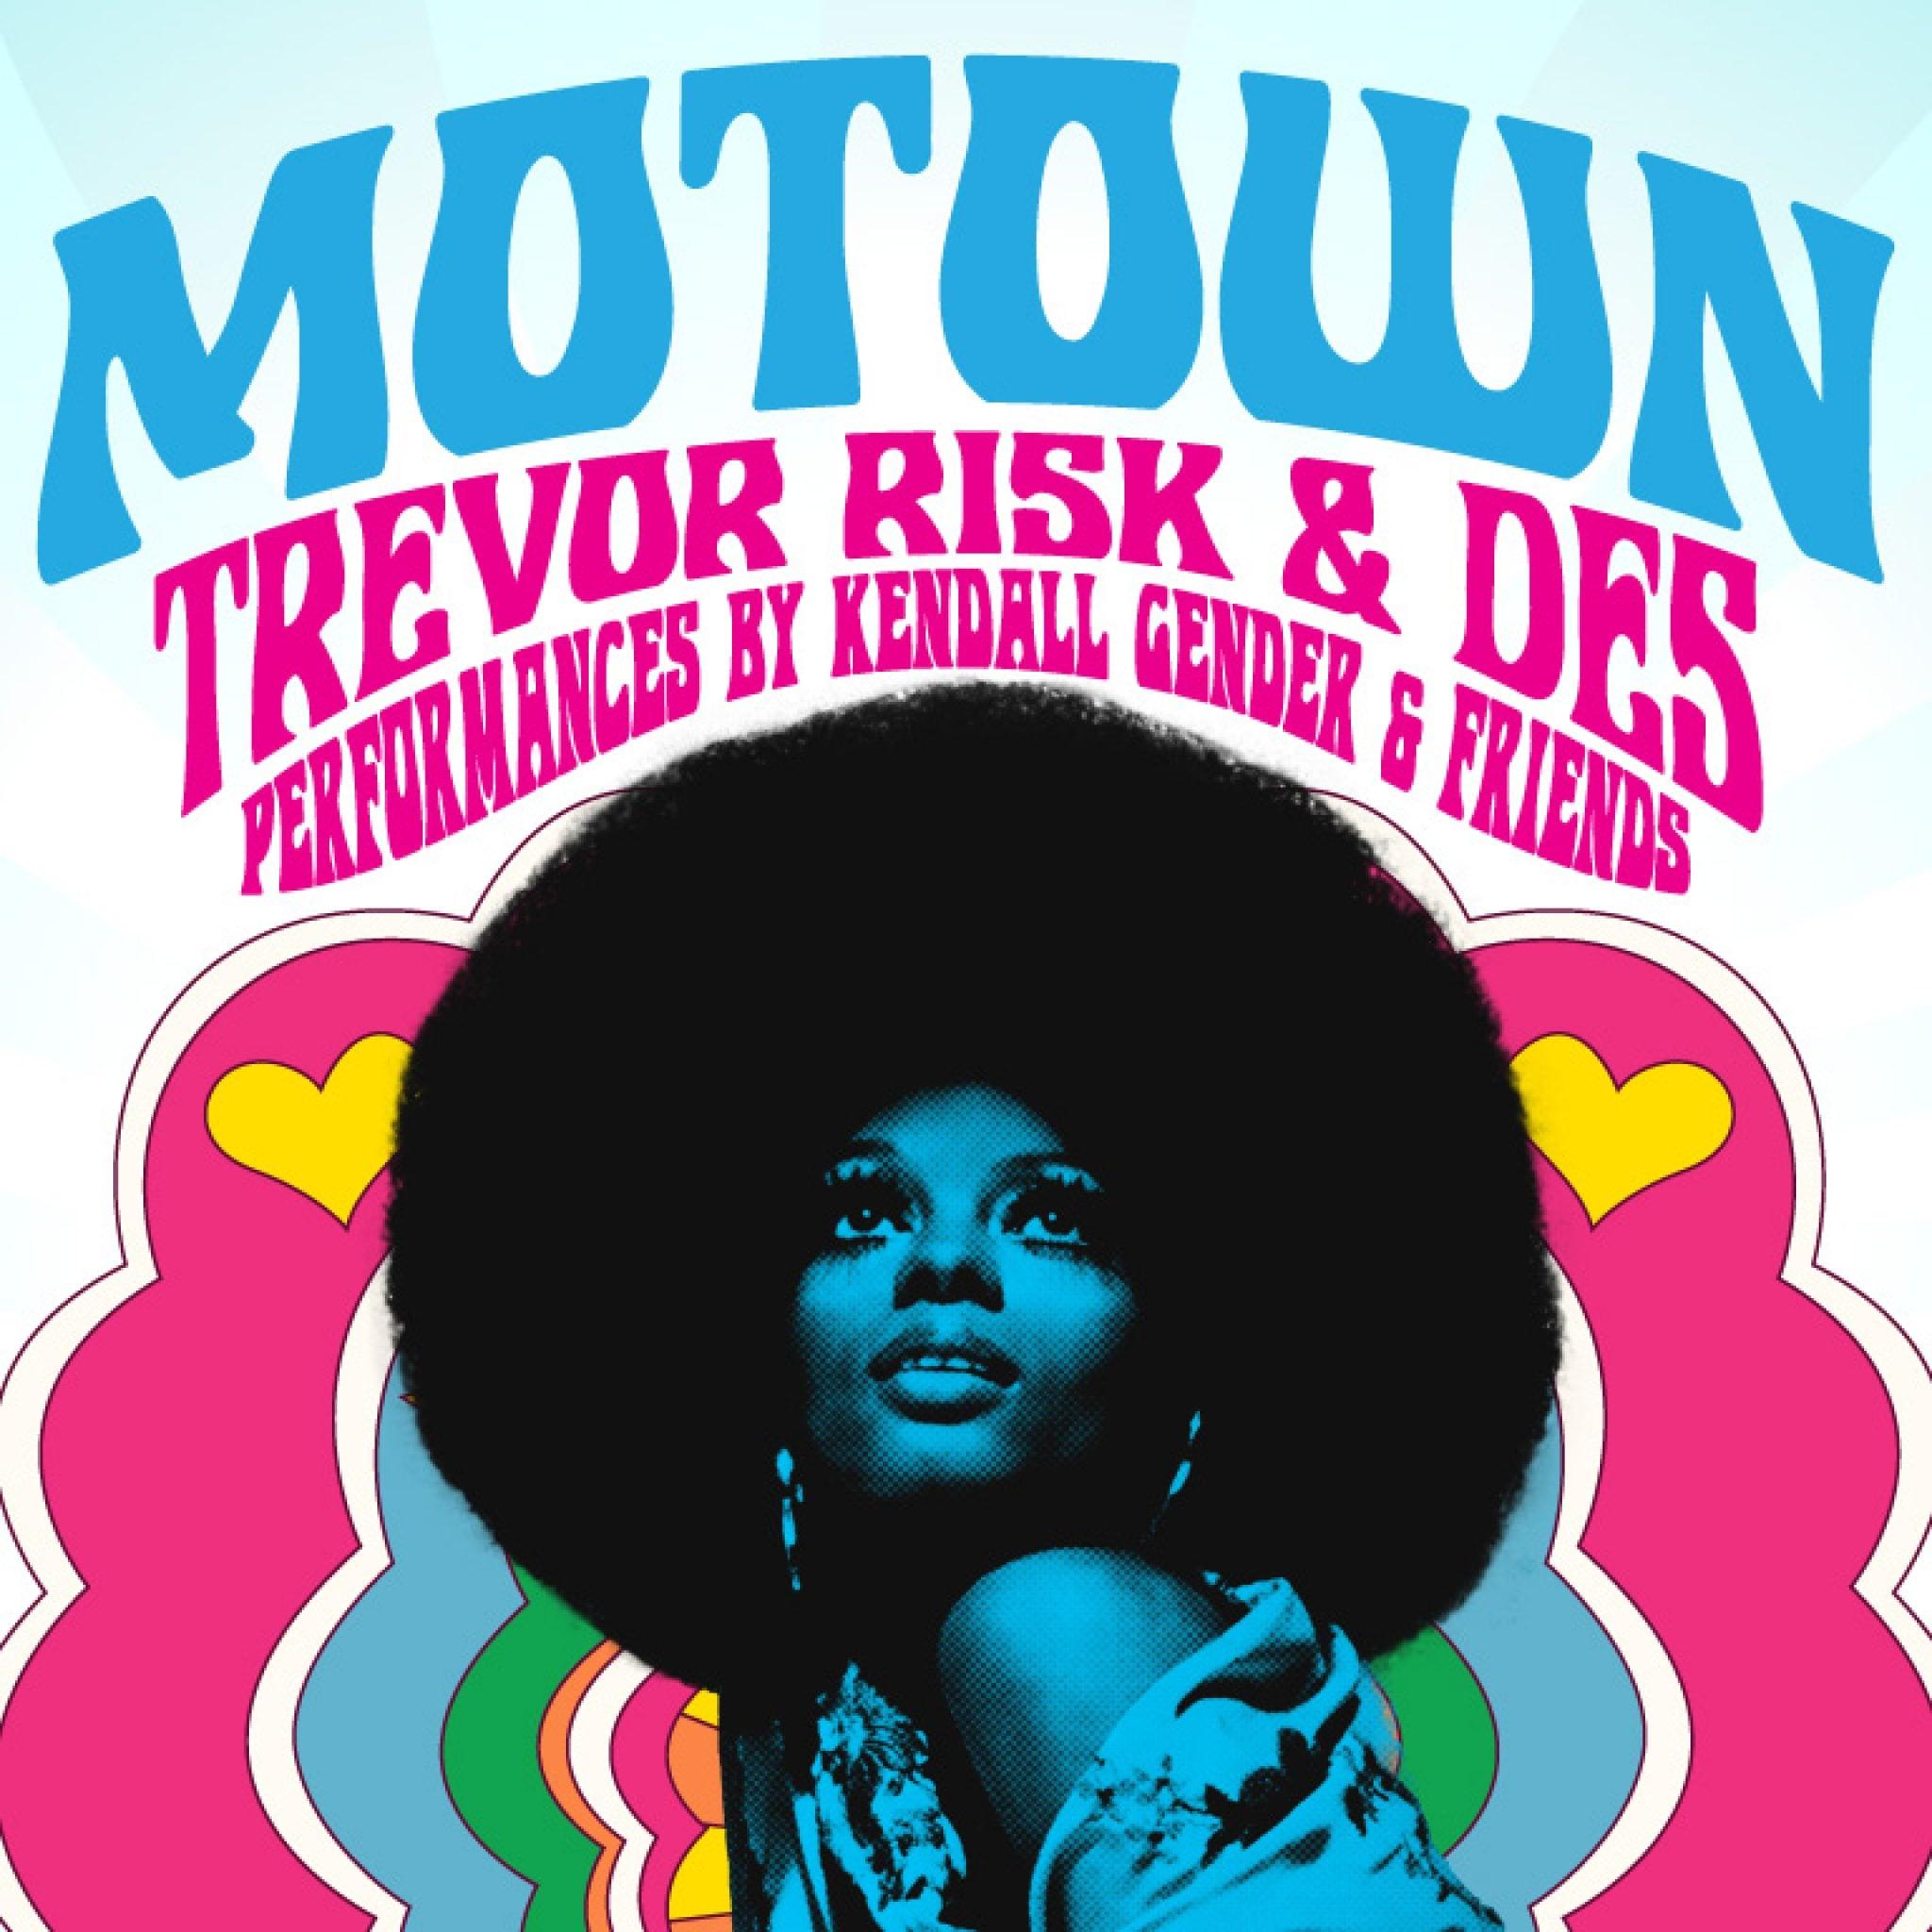 Motown Pride Party